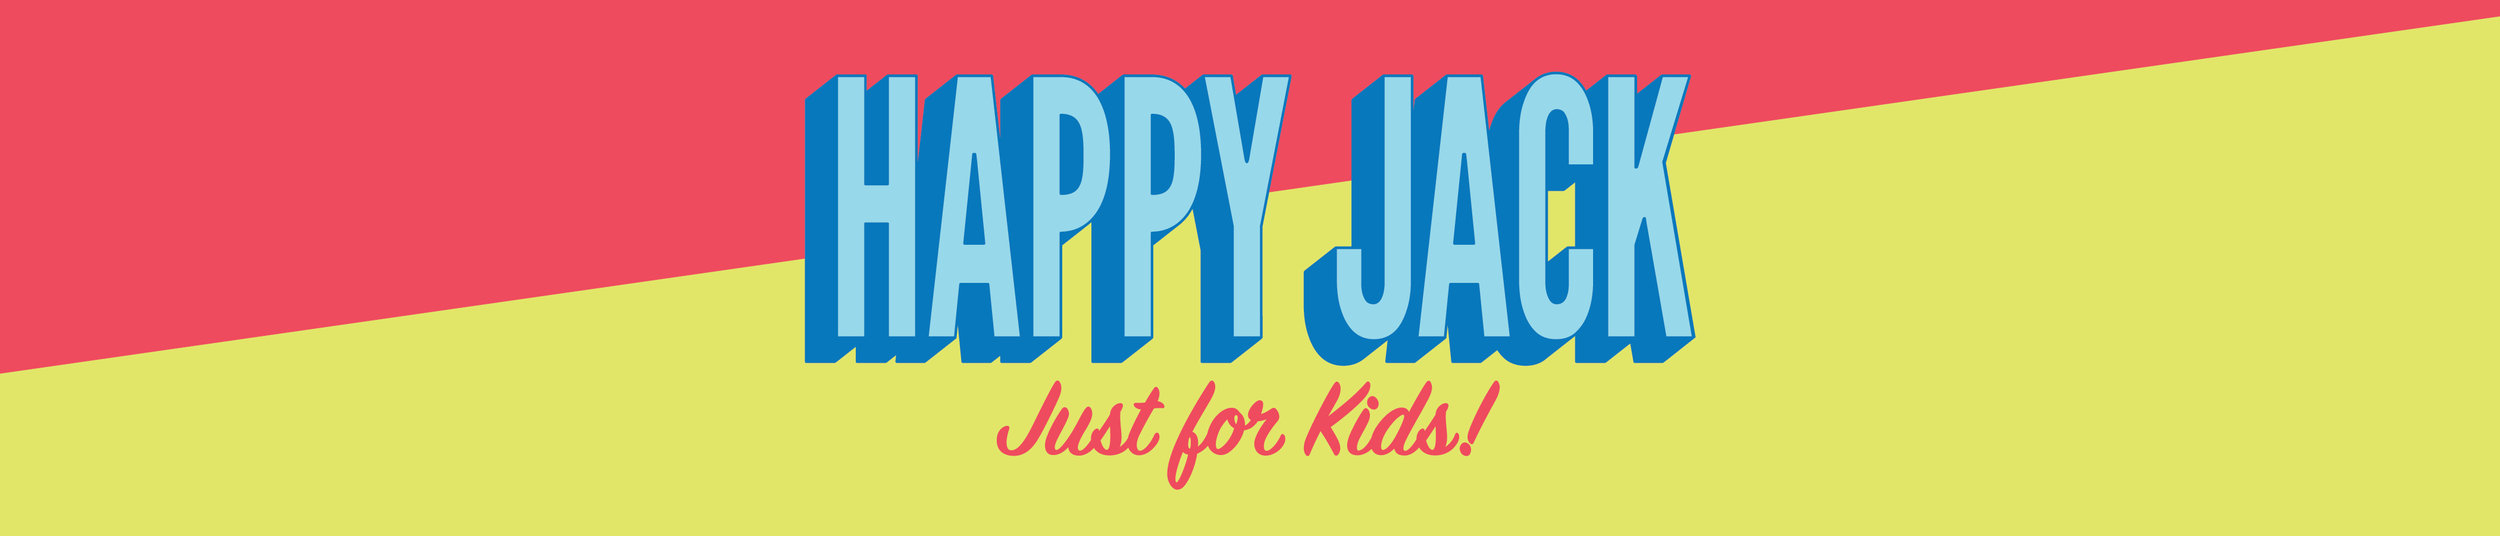 HappyJack_JustForKids_3-01.jpg